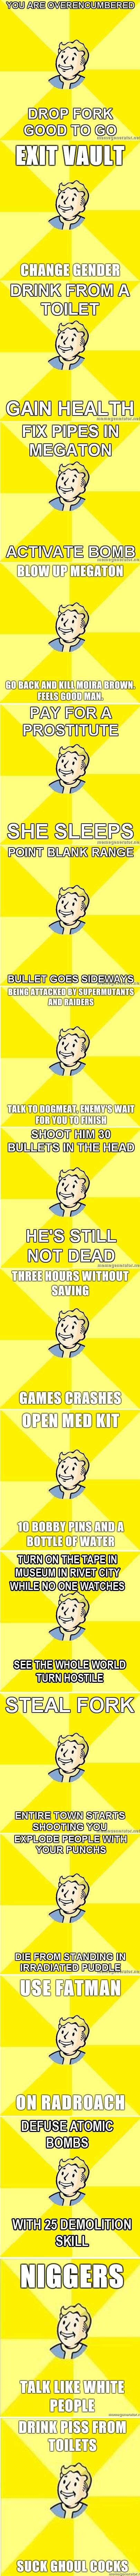 fallout meme stuff. random meme stuff about fallout 3. iii? EMU' WHERE KING} AC Reale , lazily,, lii) HUBER WERE PAY WEE a W BLAN , LIED DRUID' f@ h WWW iiy WHI Fallout